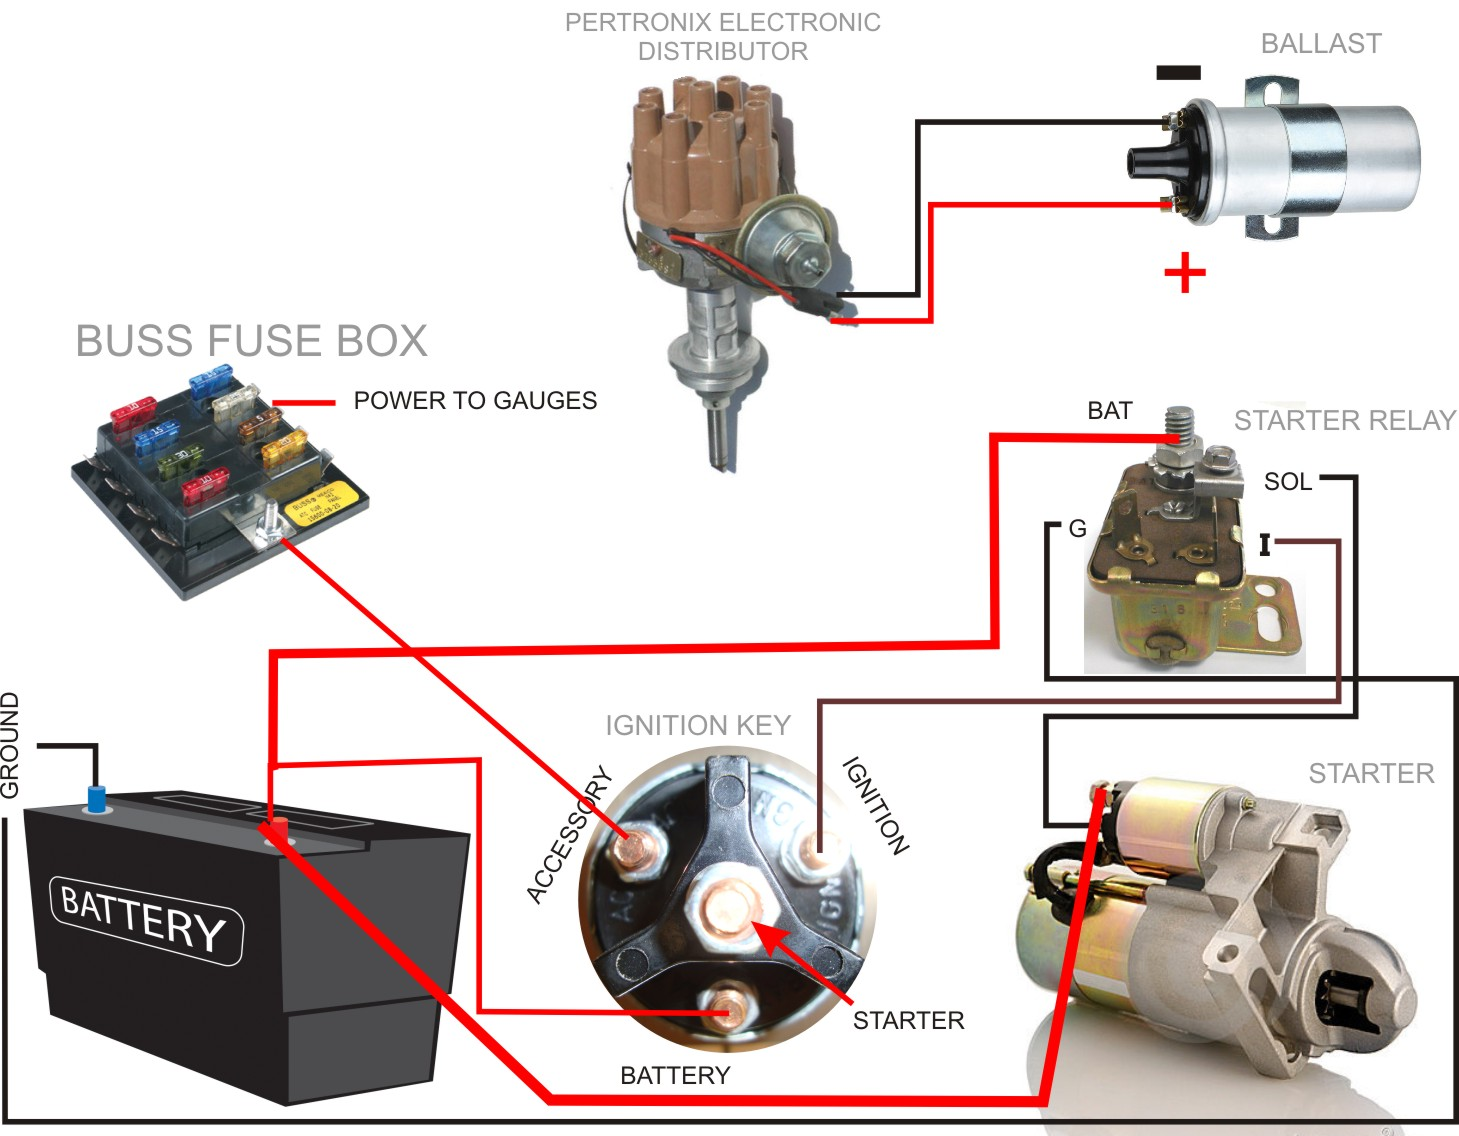 sbc engine test stand wiring diagram